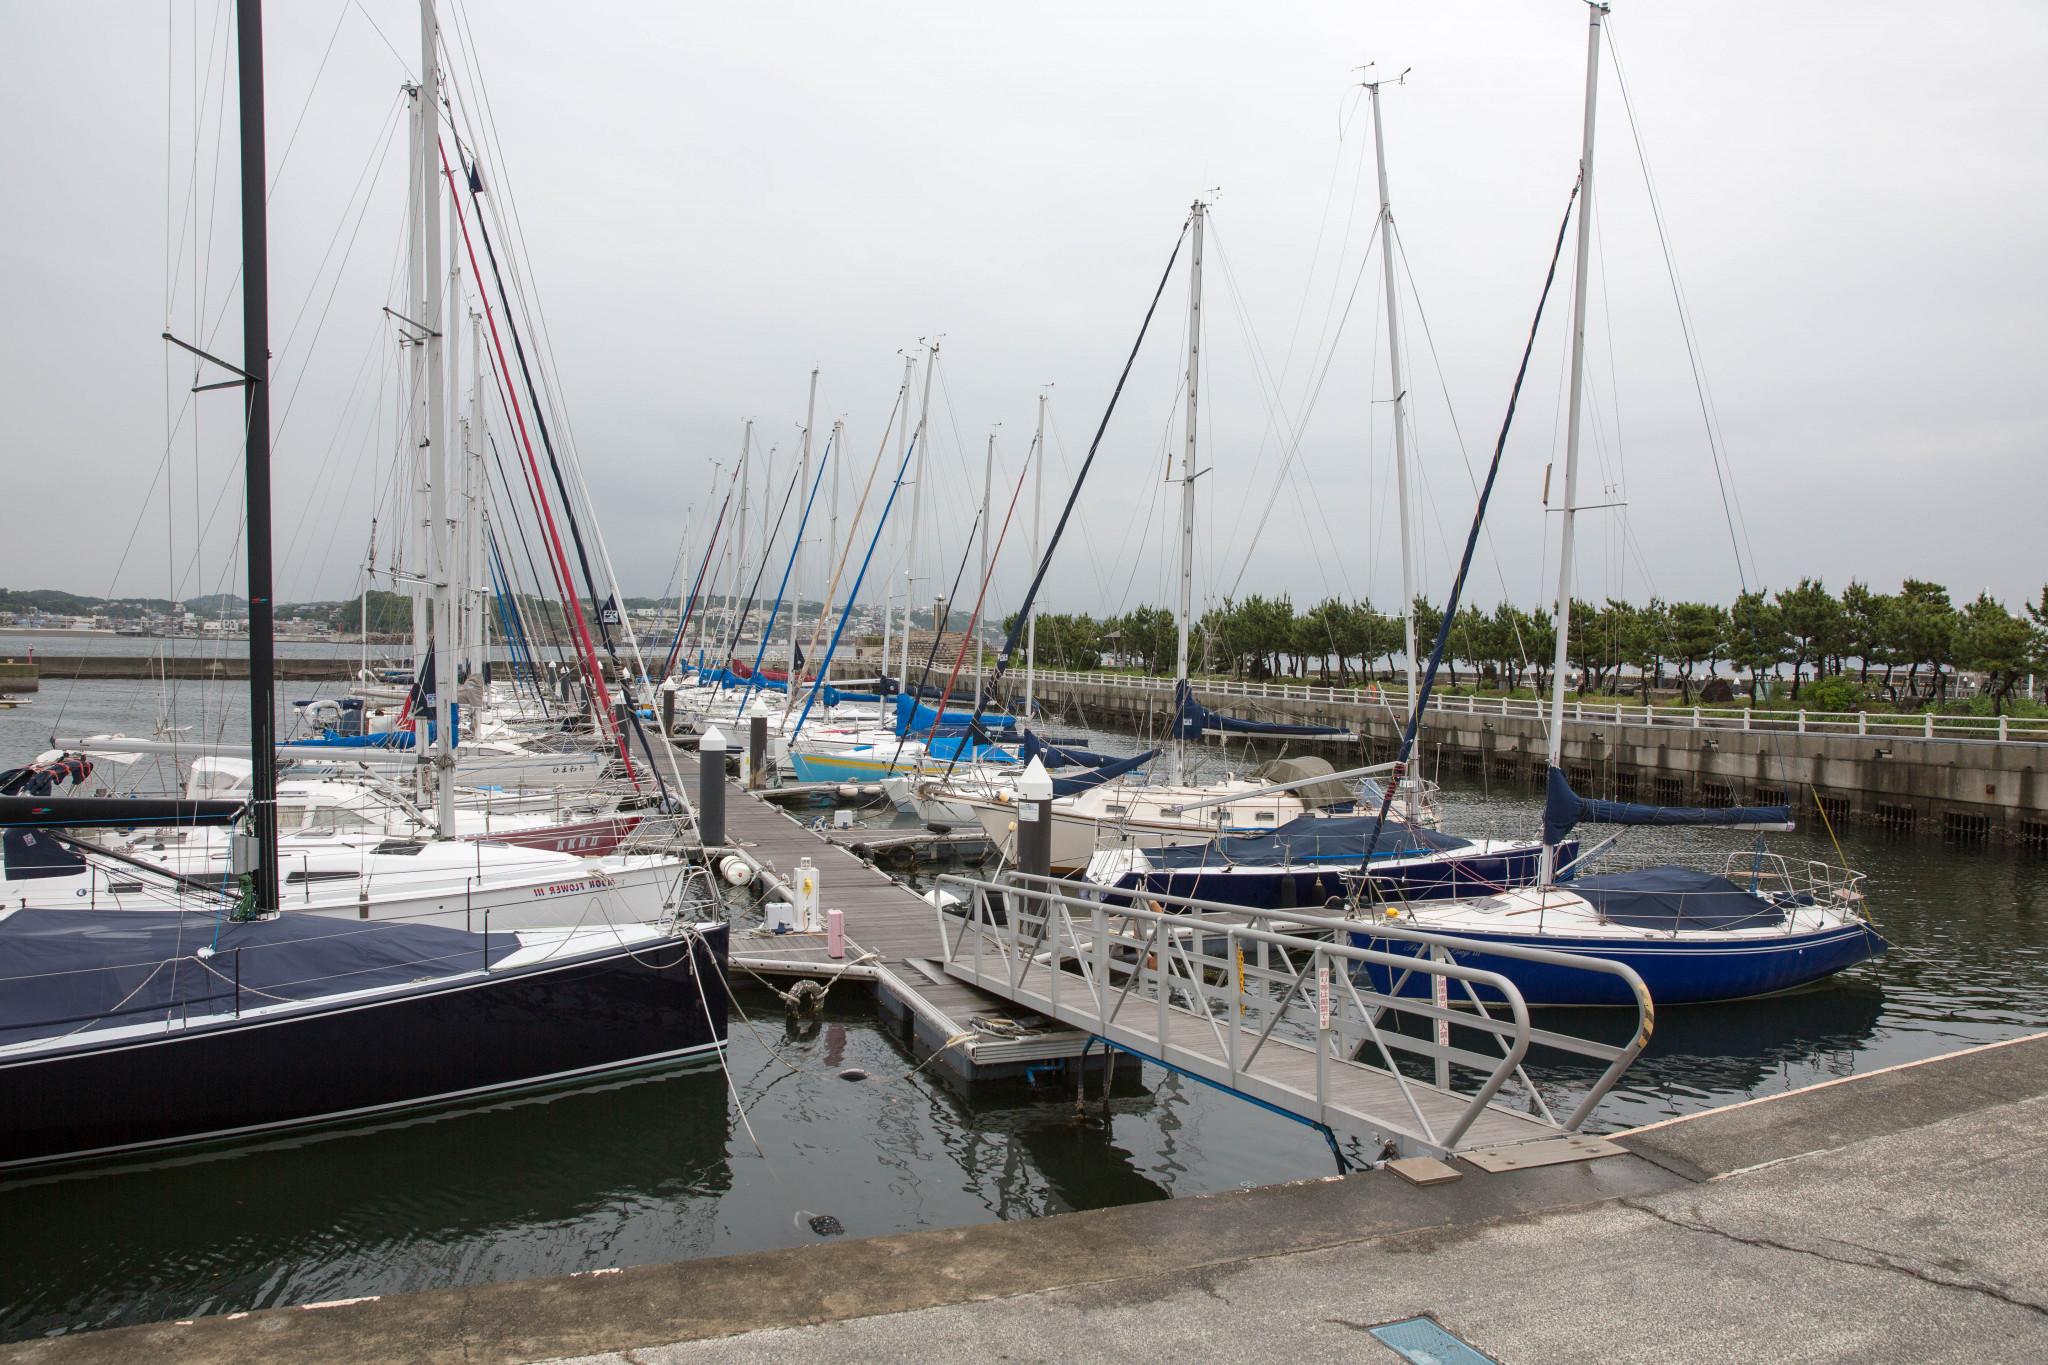 Sailing lead criticism of Tokyo 2020 preparations